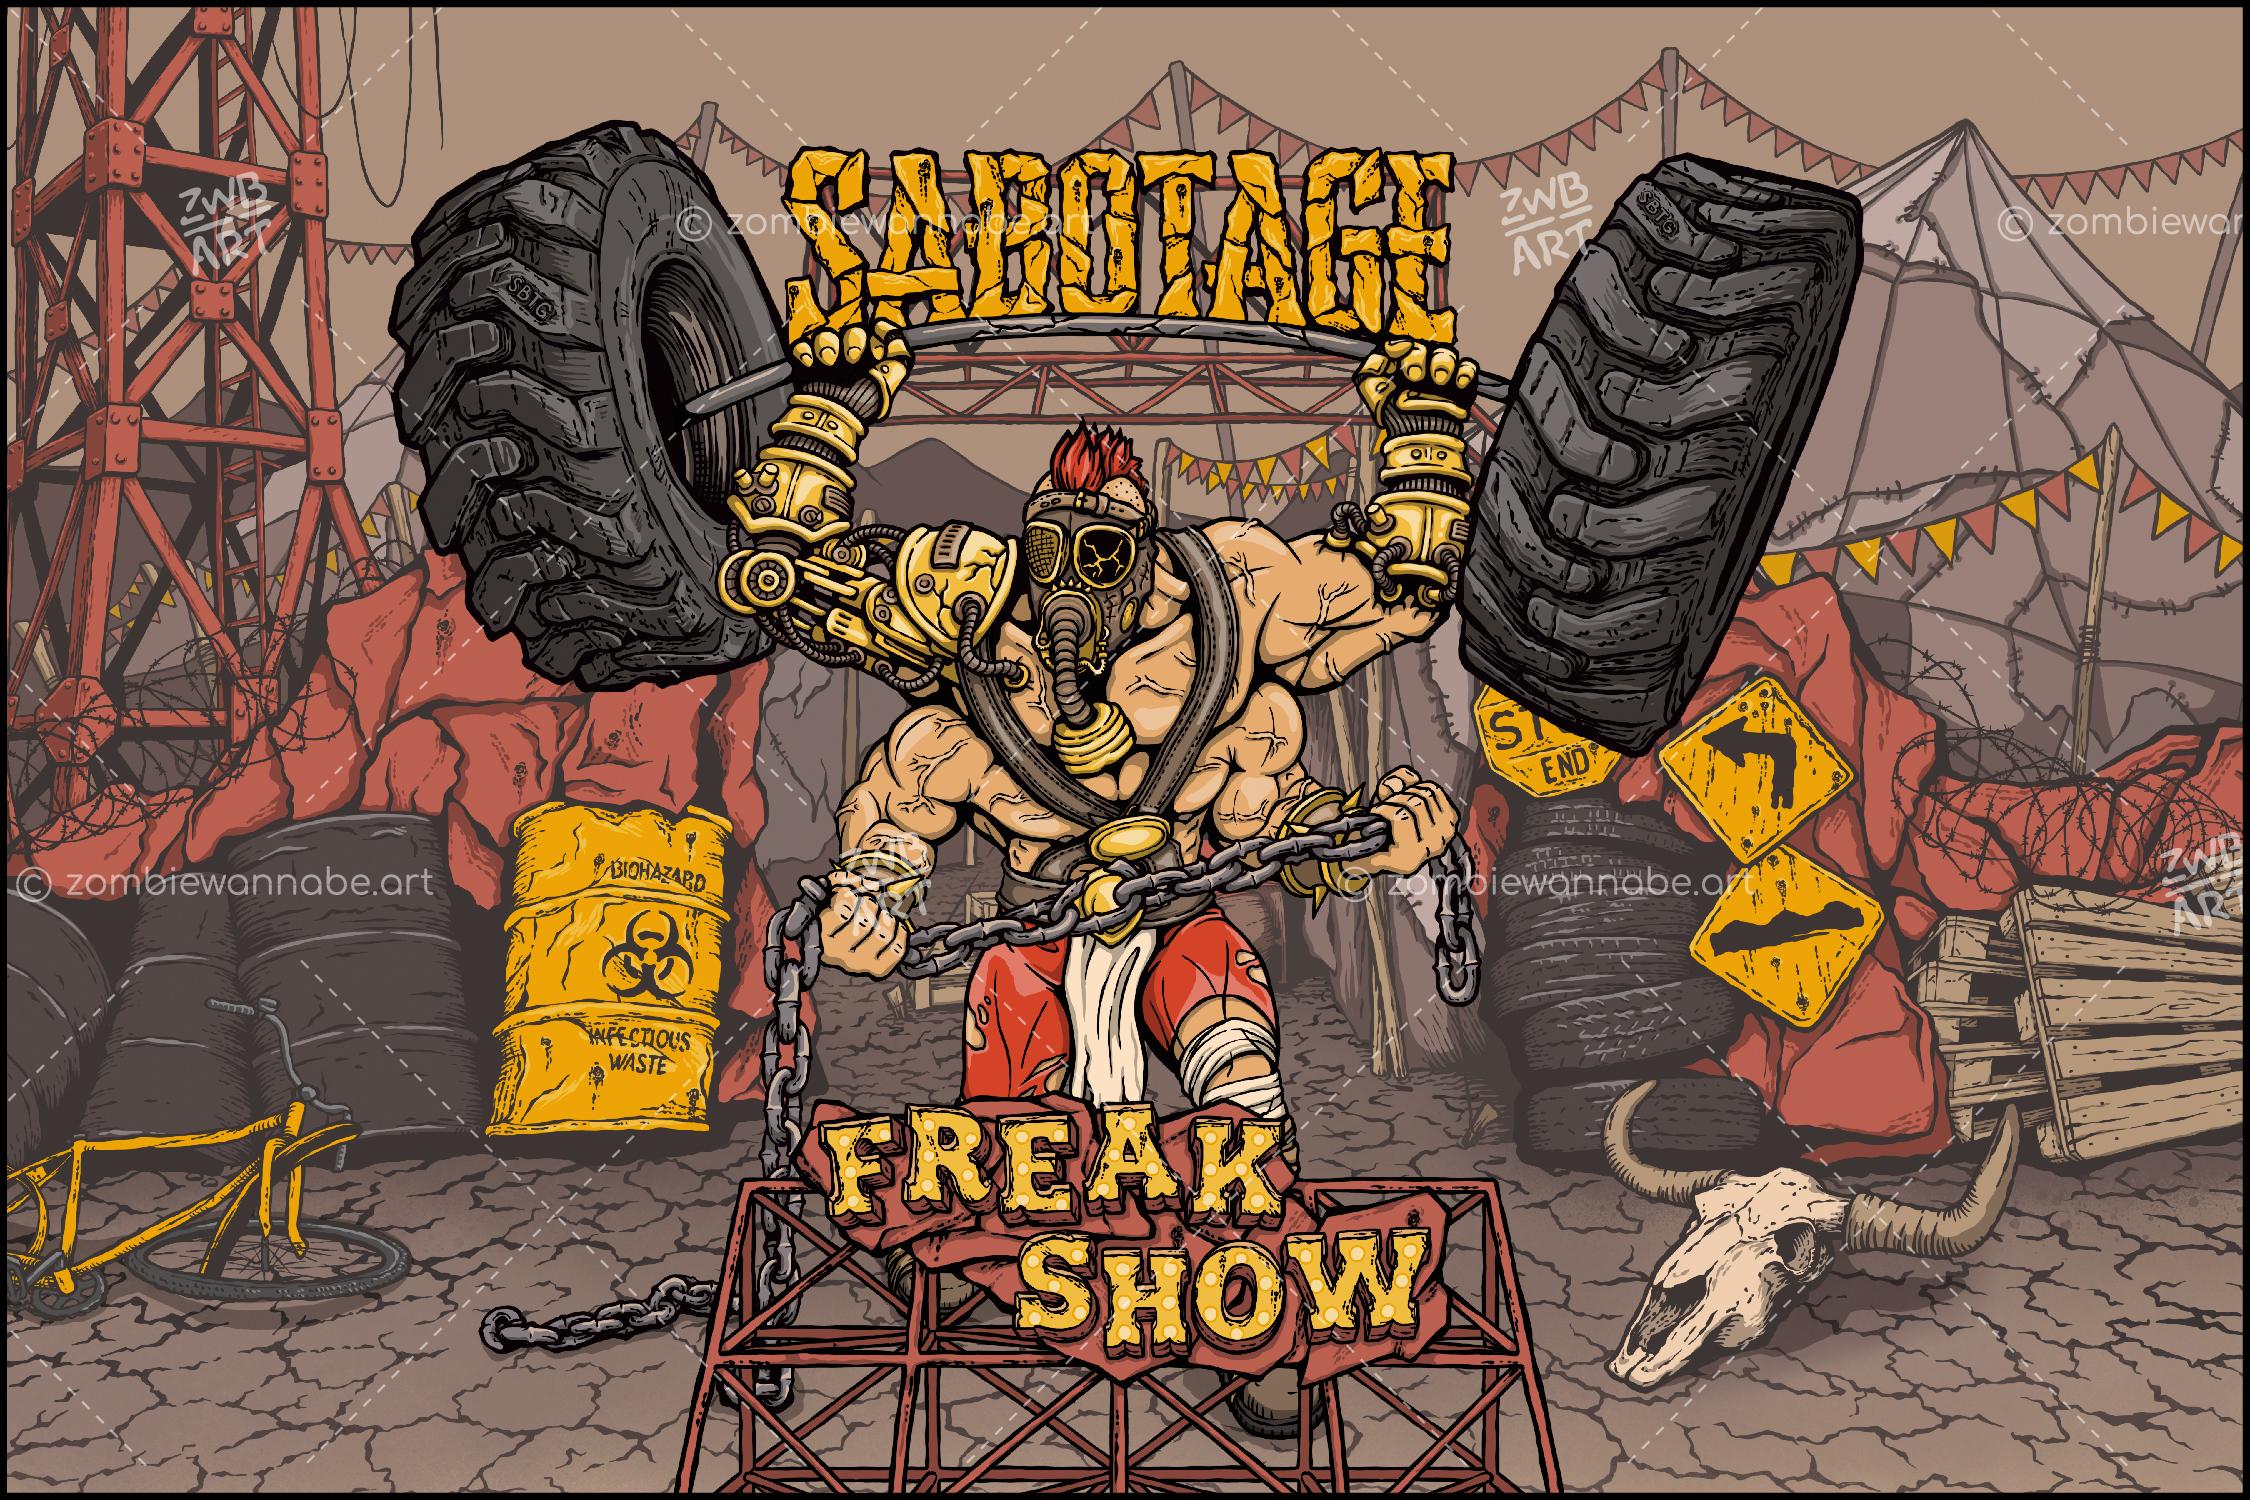 Sabotage - Freak Show - commissioned work